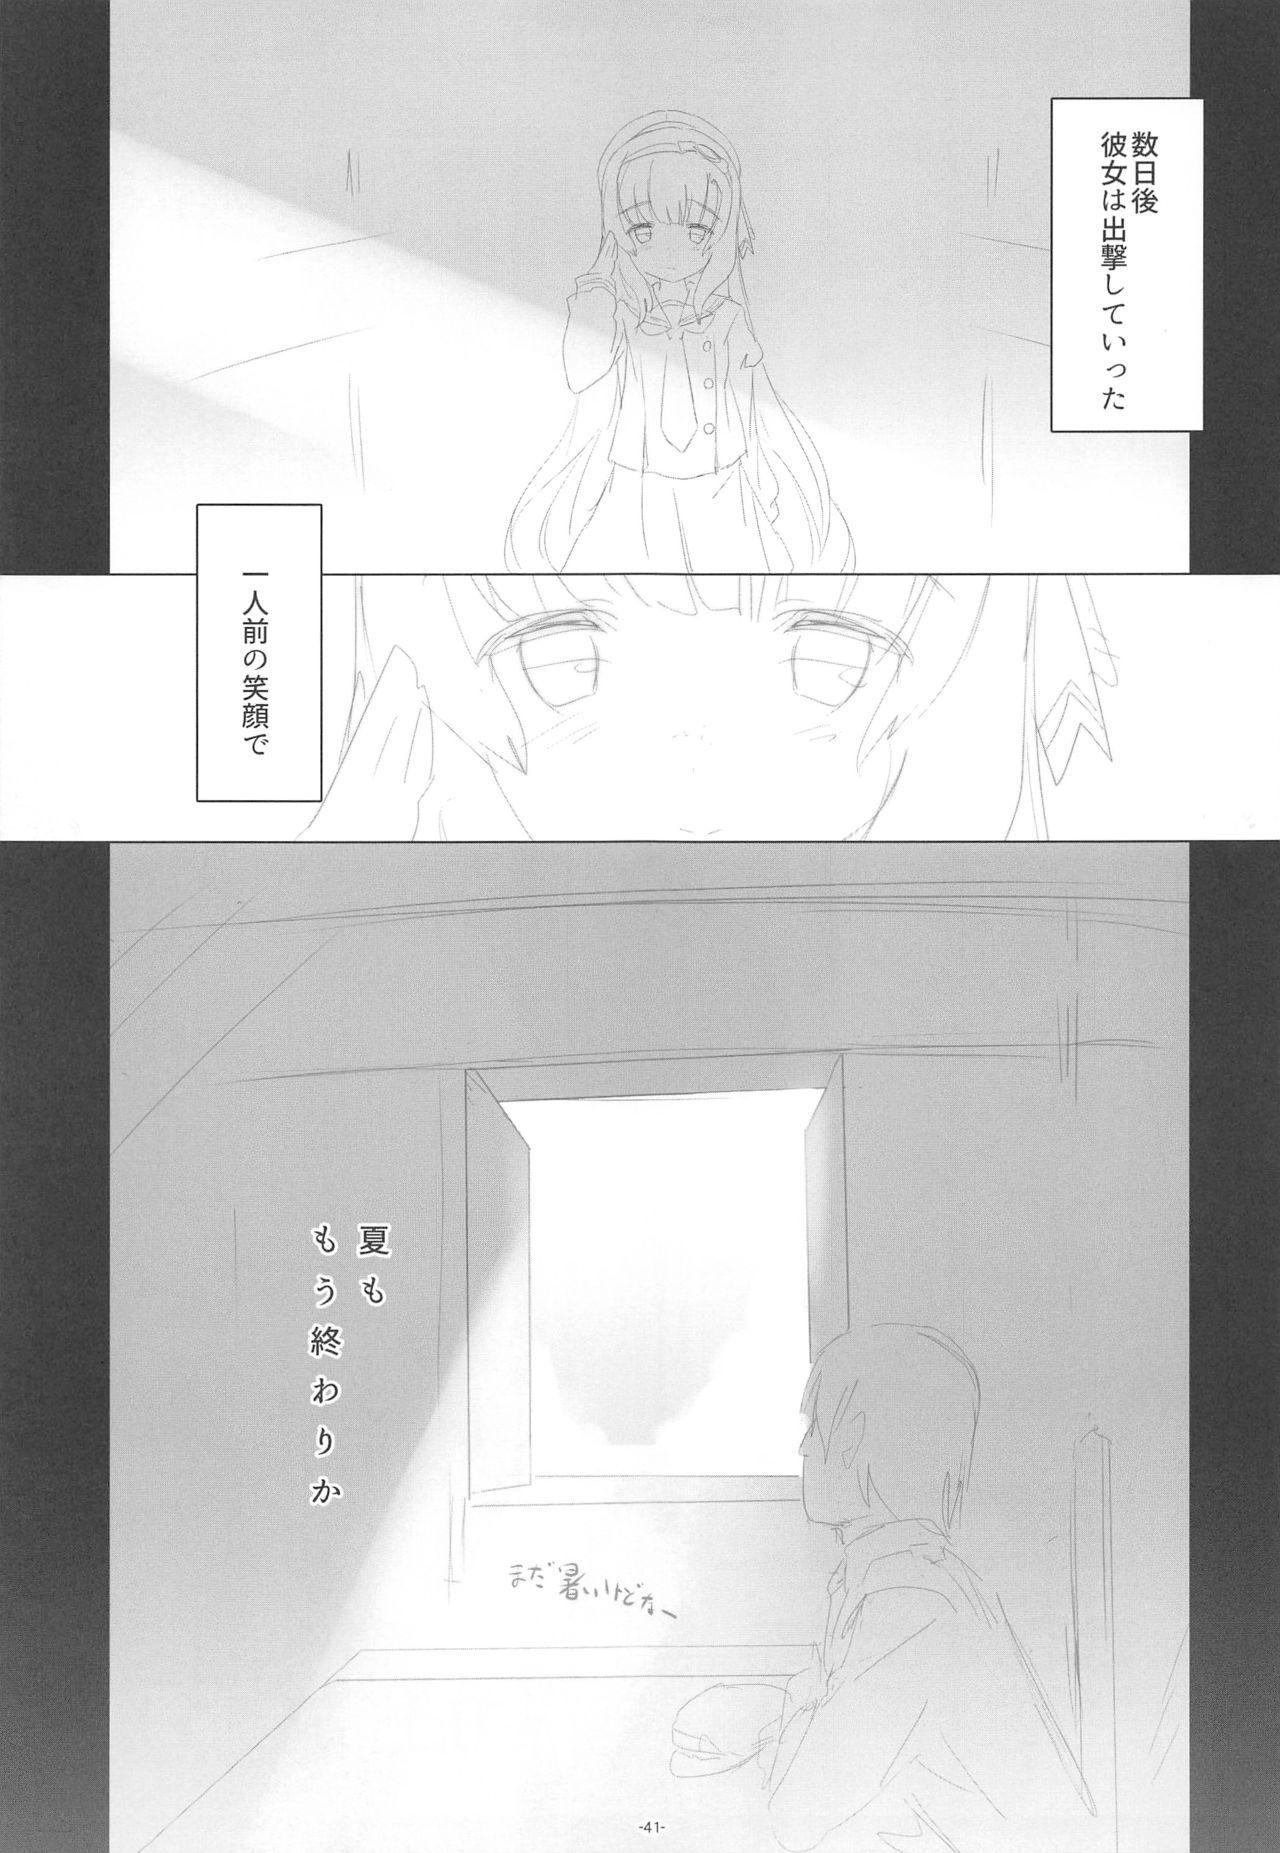 Korokoro-Manman II Korokoro:P Soushuuhen II 39